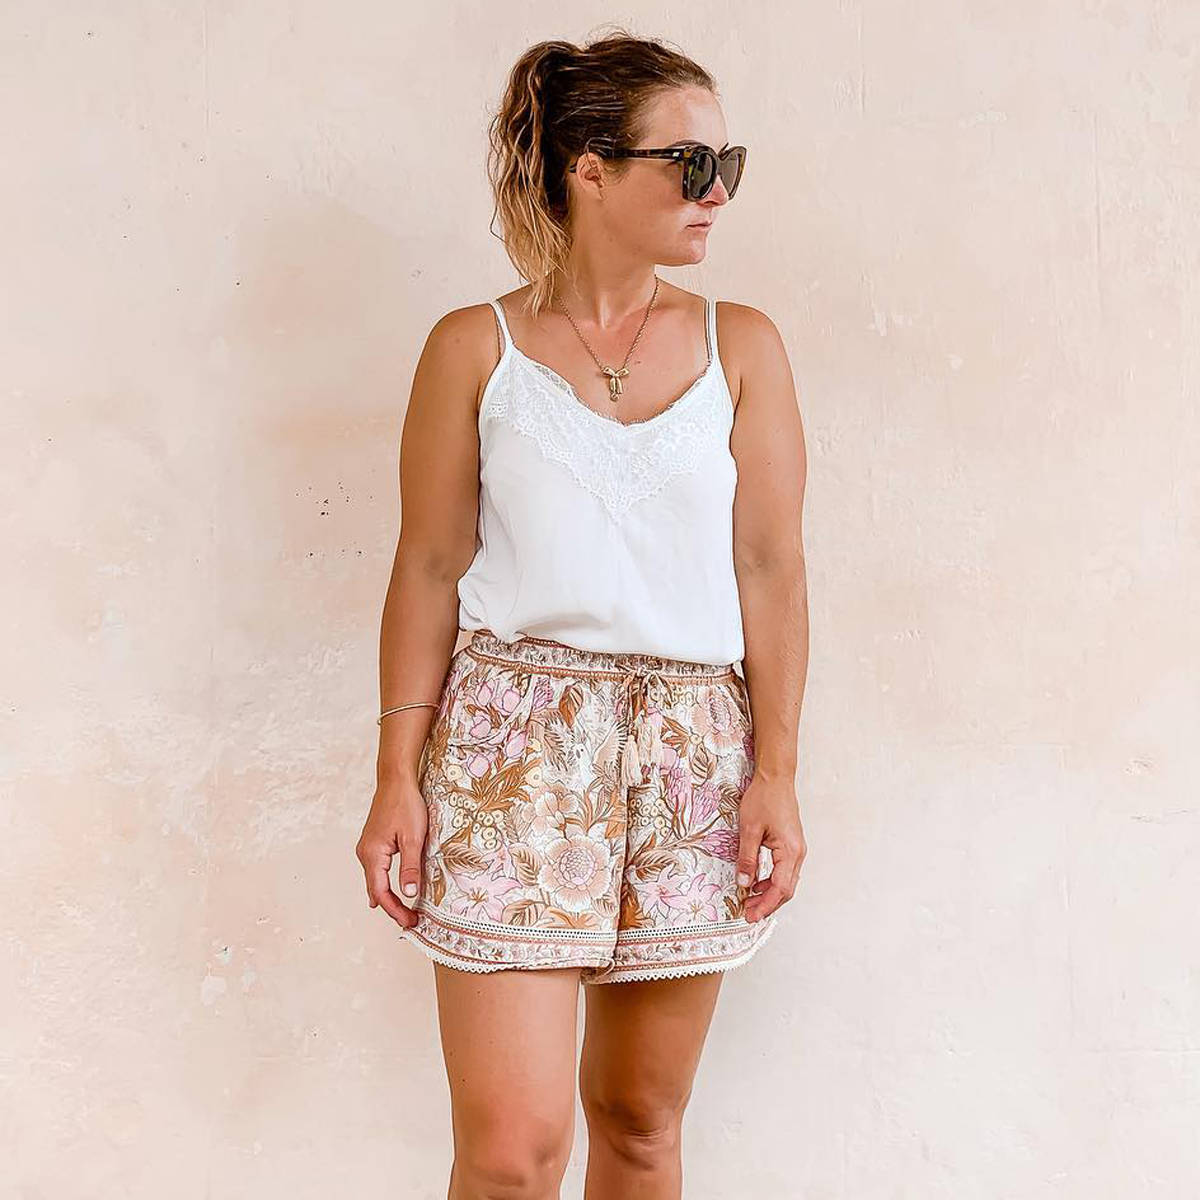 Jastie Elastic High Waist Shorts Women Casual Beach Boho Shorts Female Loose Summer Short Pant Bottom Pantalones Cortos Mujer